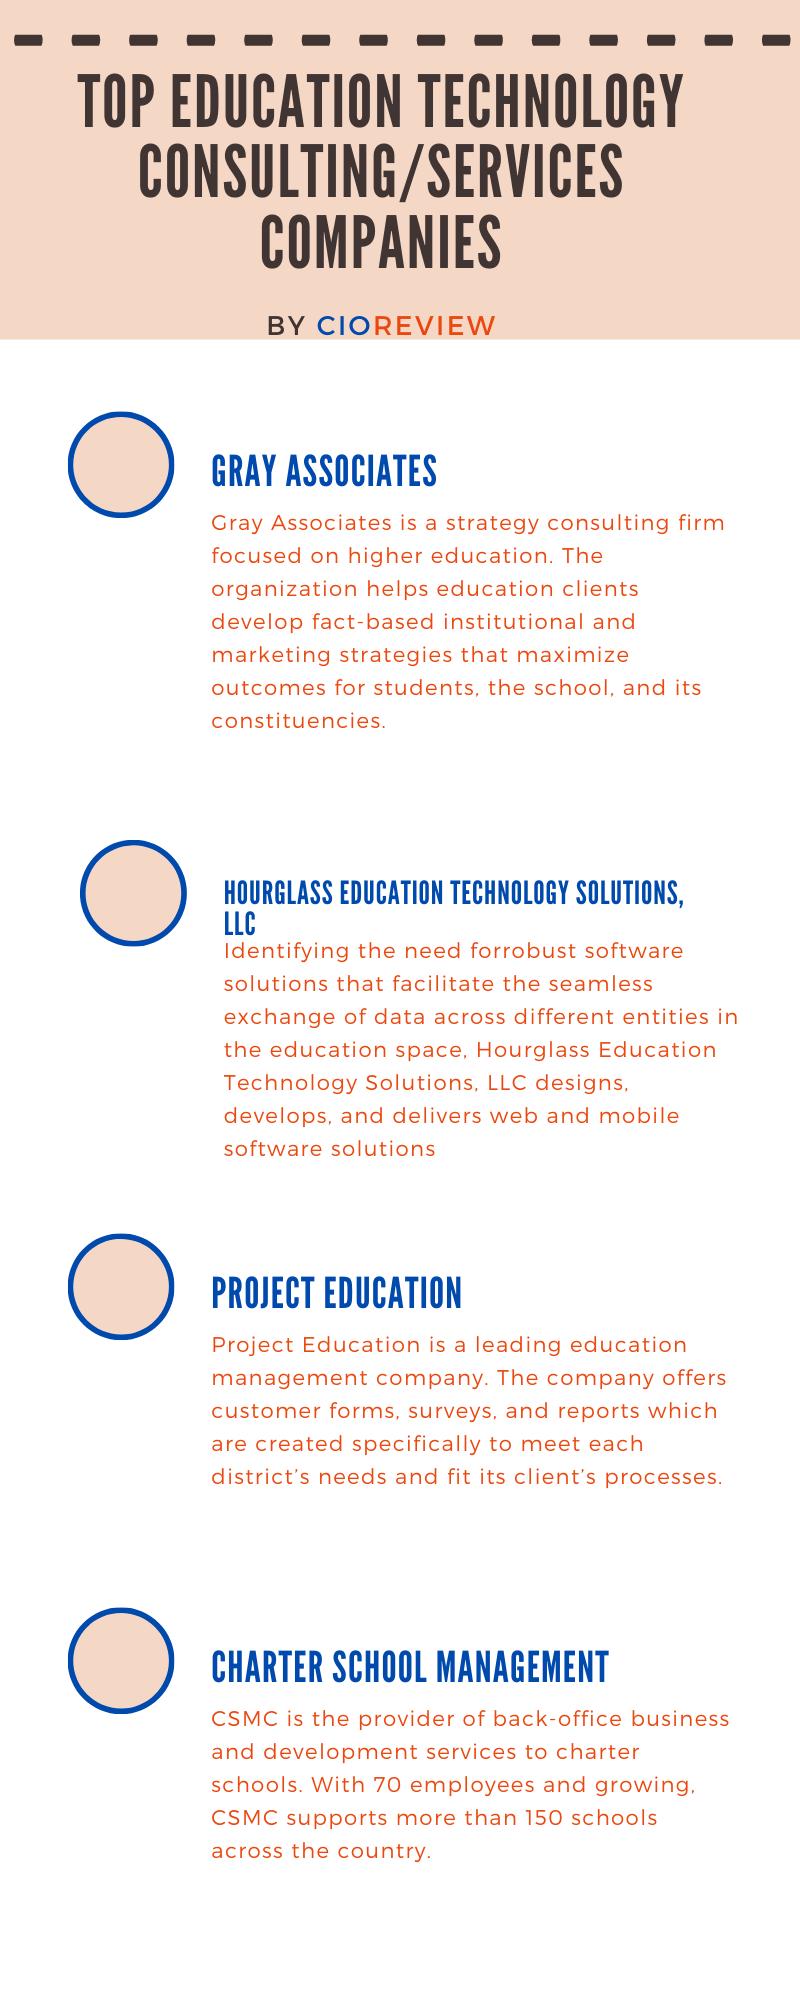 Top Education Technology Companies Educational Technology Education Management Education